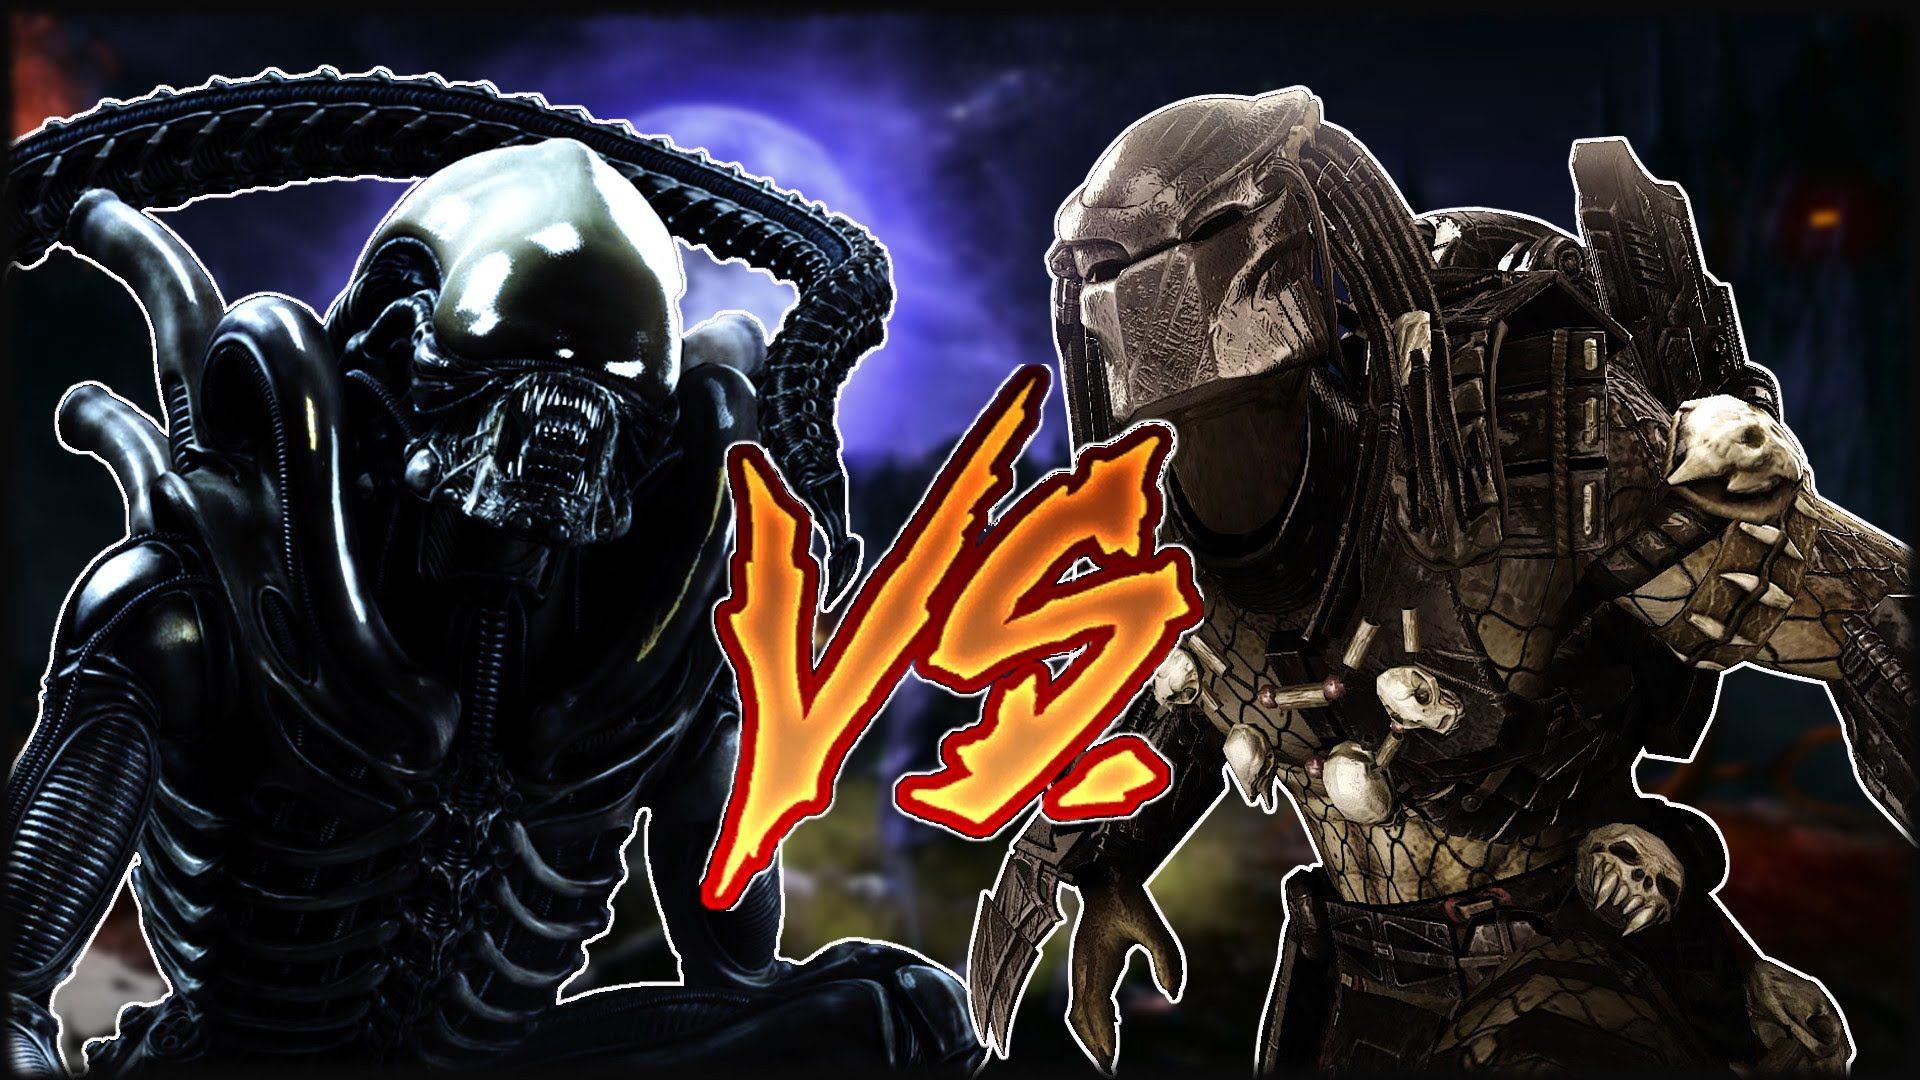 Alien Vs  Predator | Mortal Kombat X Gameplay | Mortal